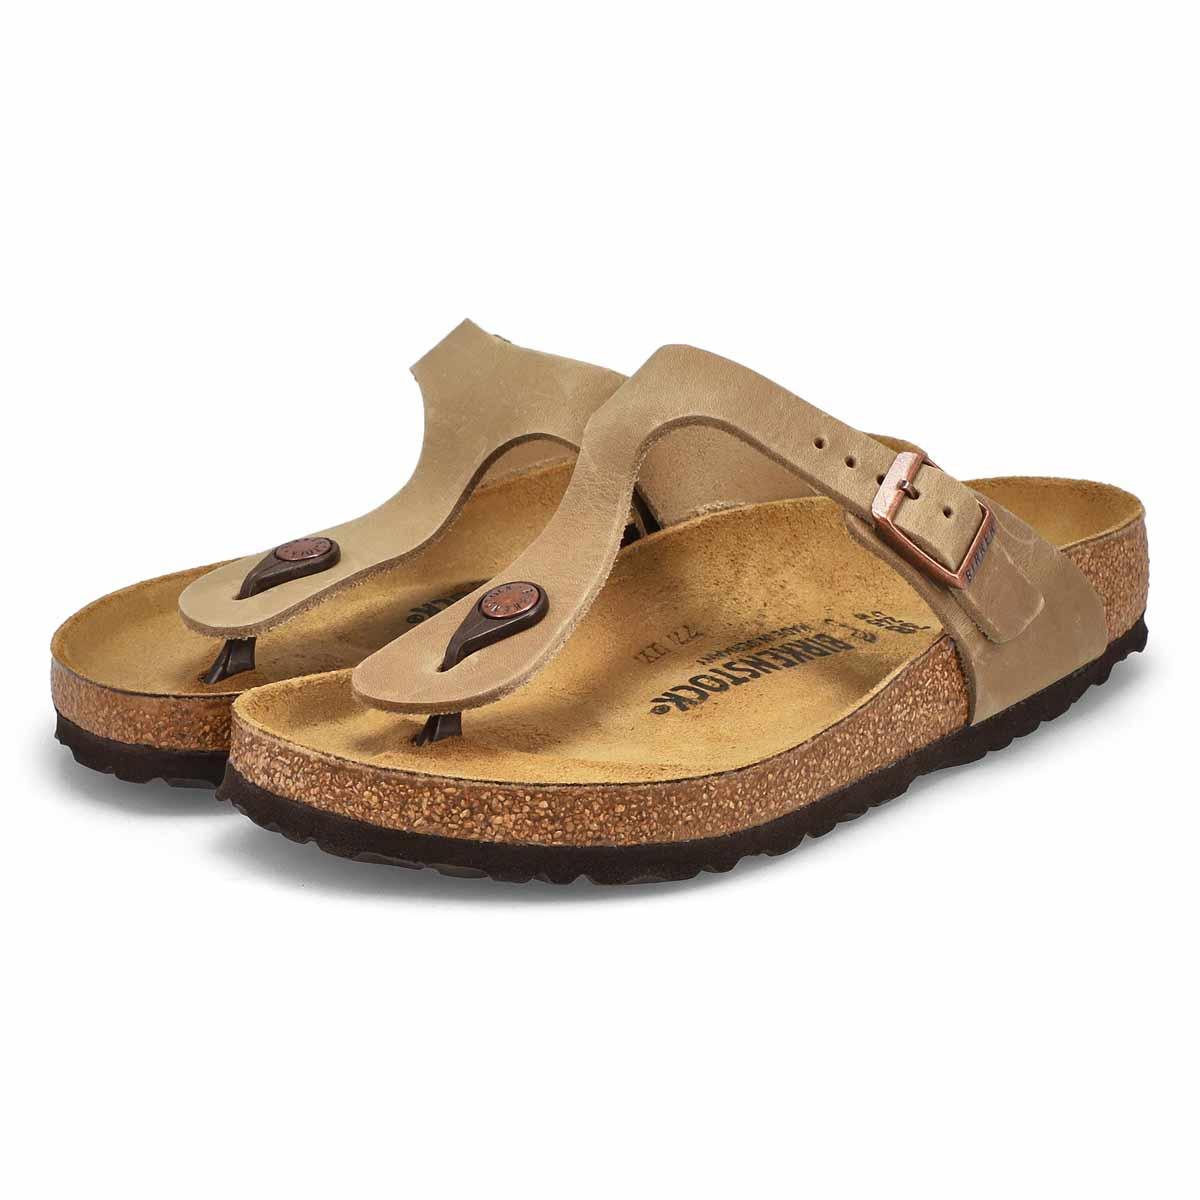 Sandales tongs Gizeh, cuir tabac, fem